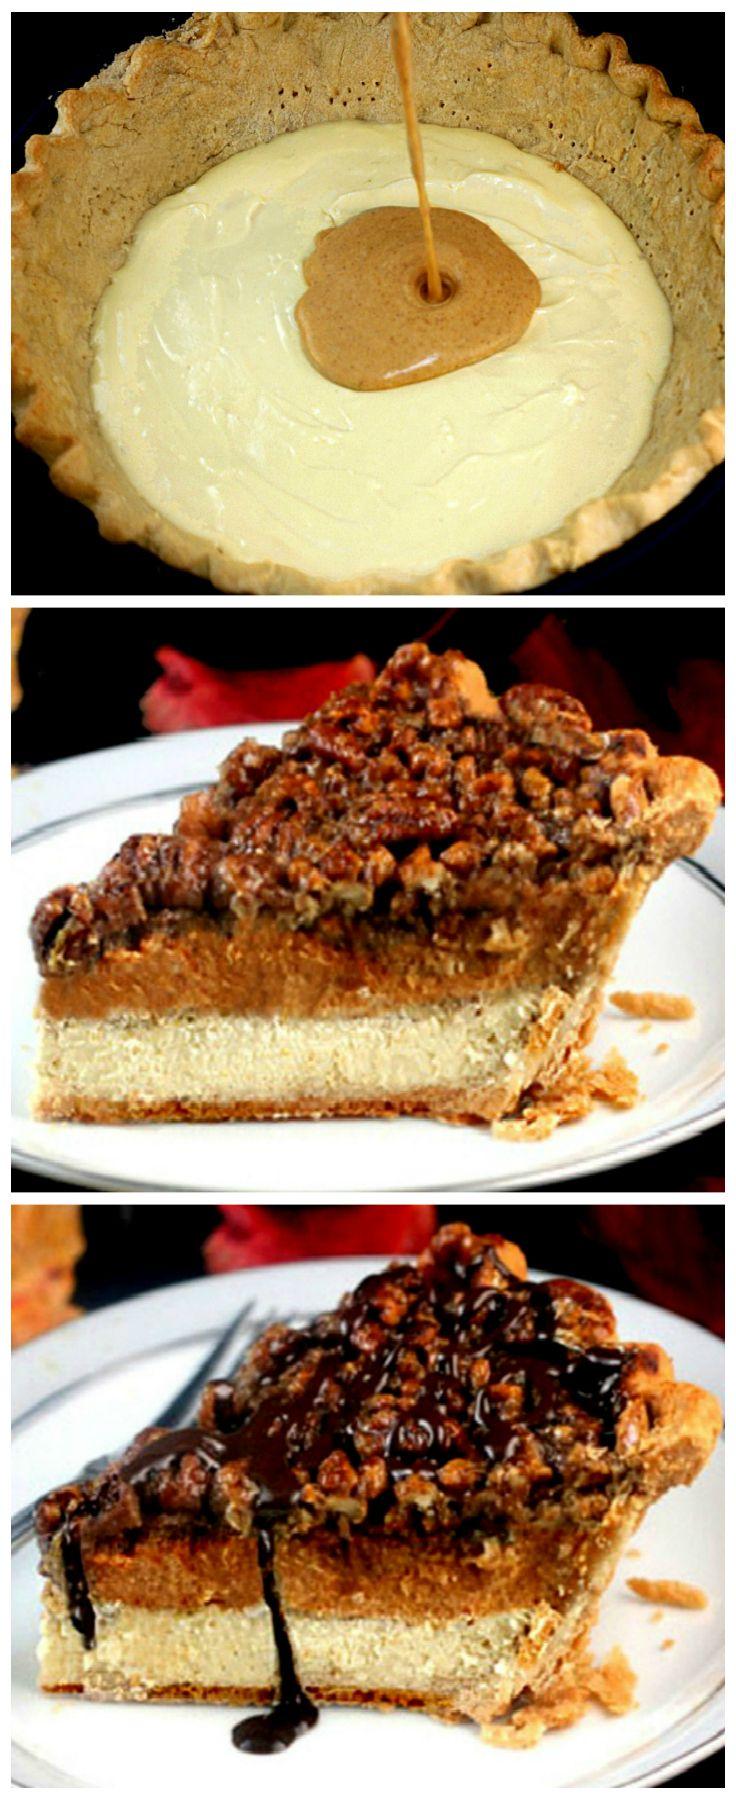 Cheesecake Pumpkin Pecan Pie aka Chumpcan Pie! -Three Pies in One! A Cheesecake layer, a pumpkin pie layer and a pecan pie layer! The ultimate Thanksgiving/Holiday pie!